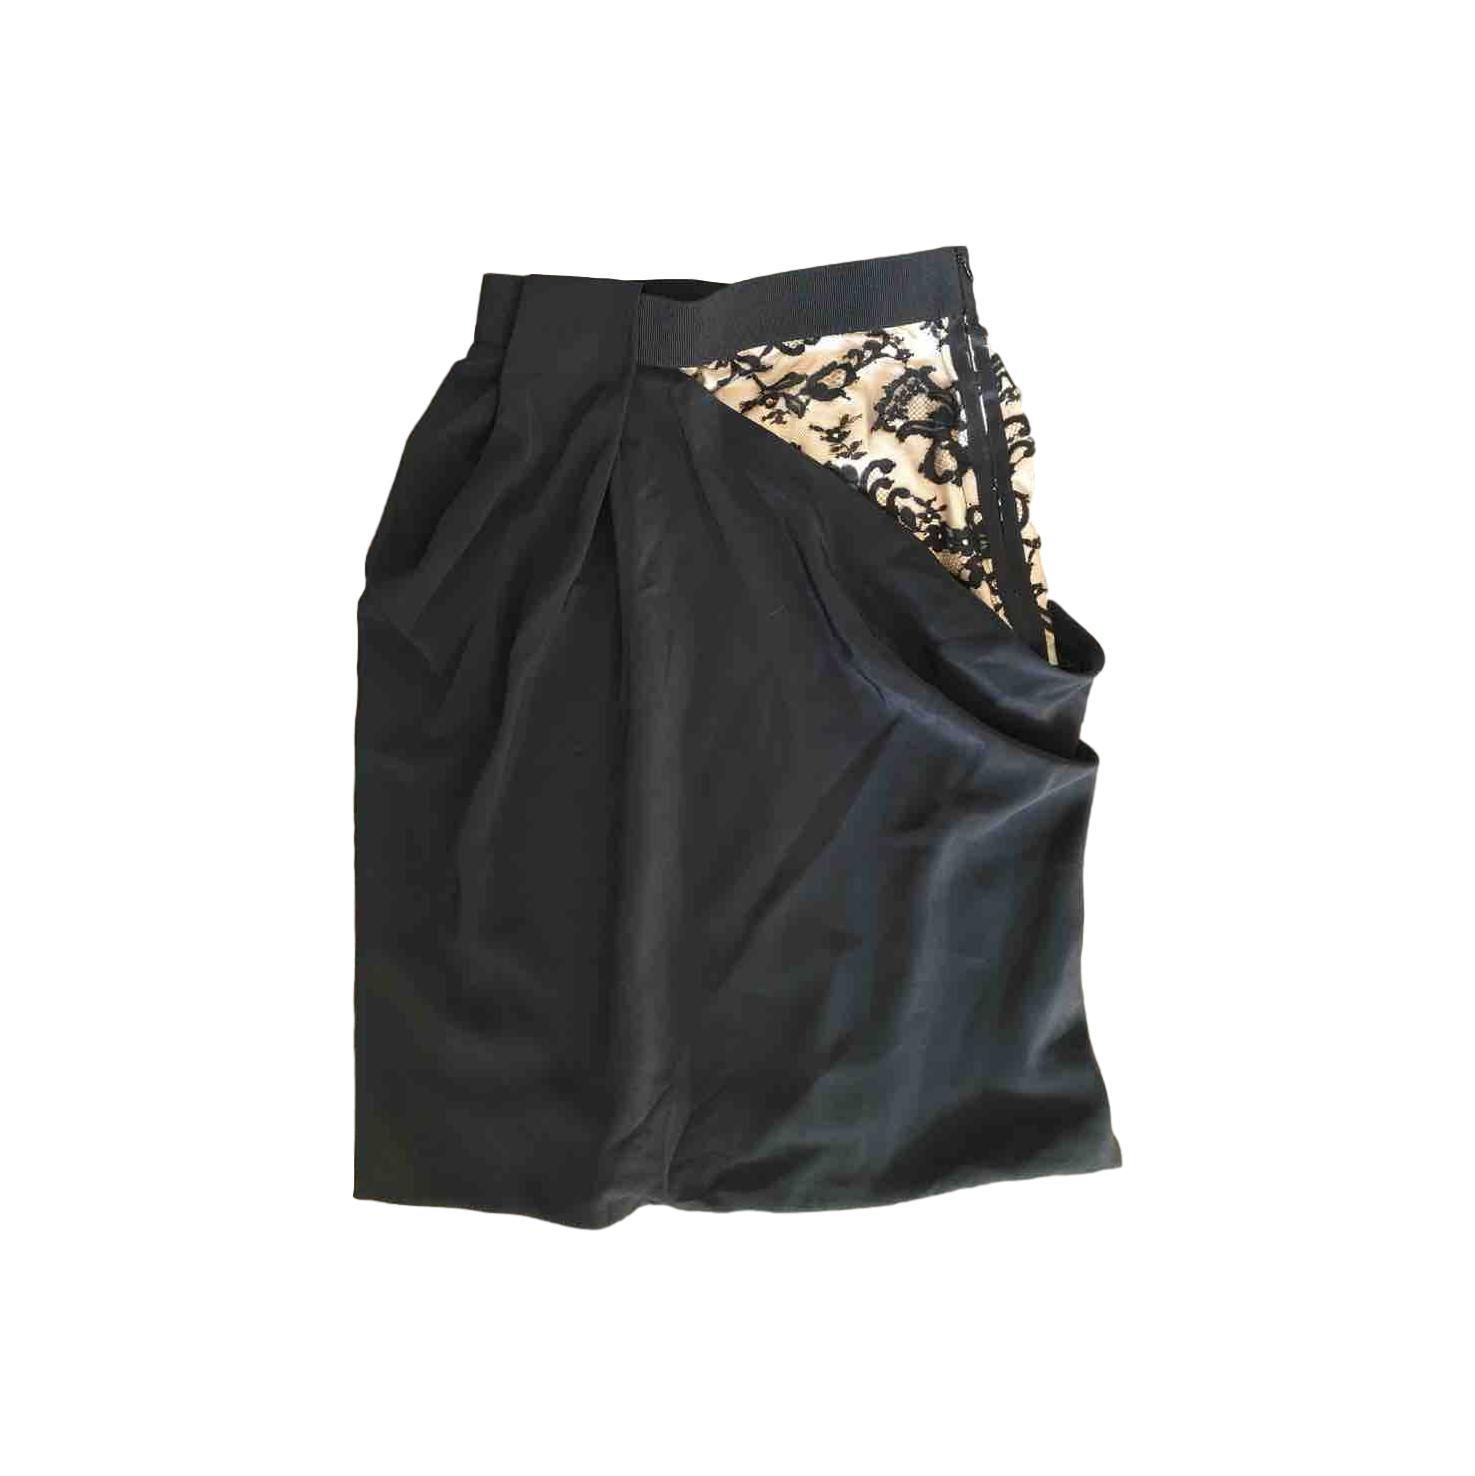 d5c208ddb91 Купить юбку Sportmax за 2500 руб. в интернет магазине - бутике с ...